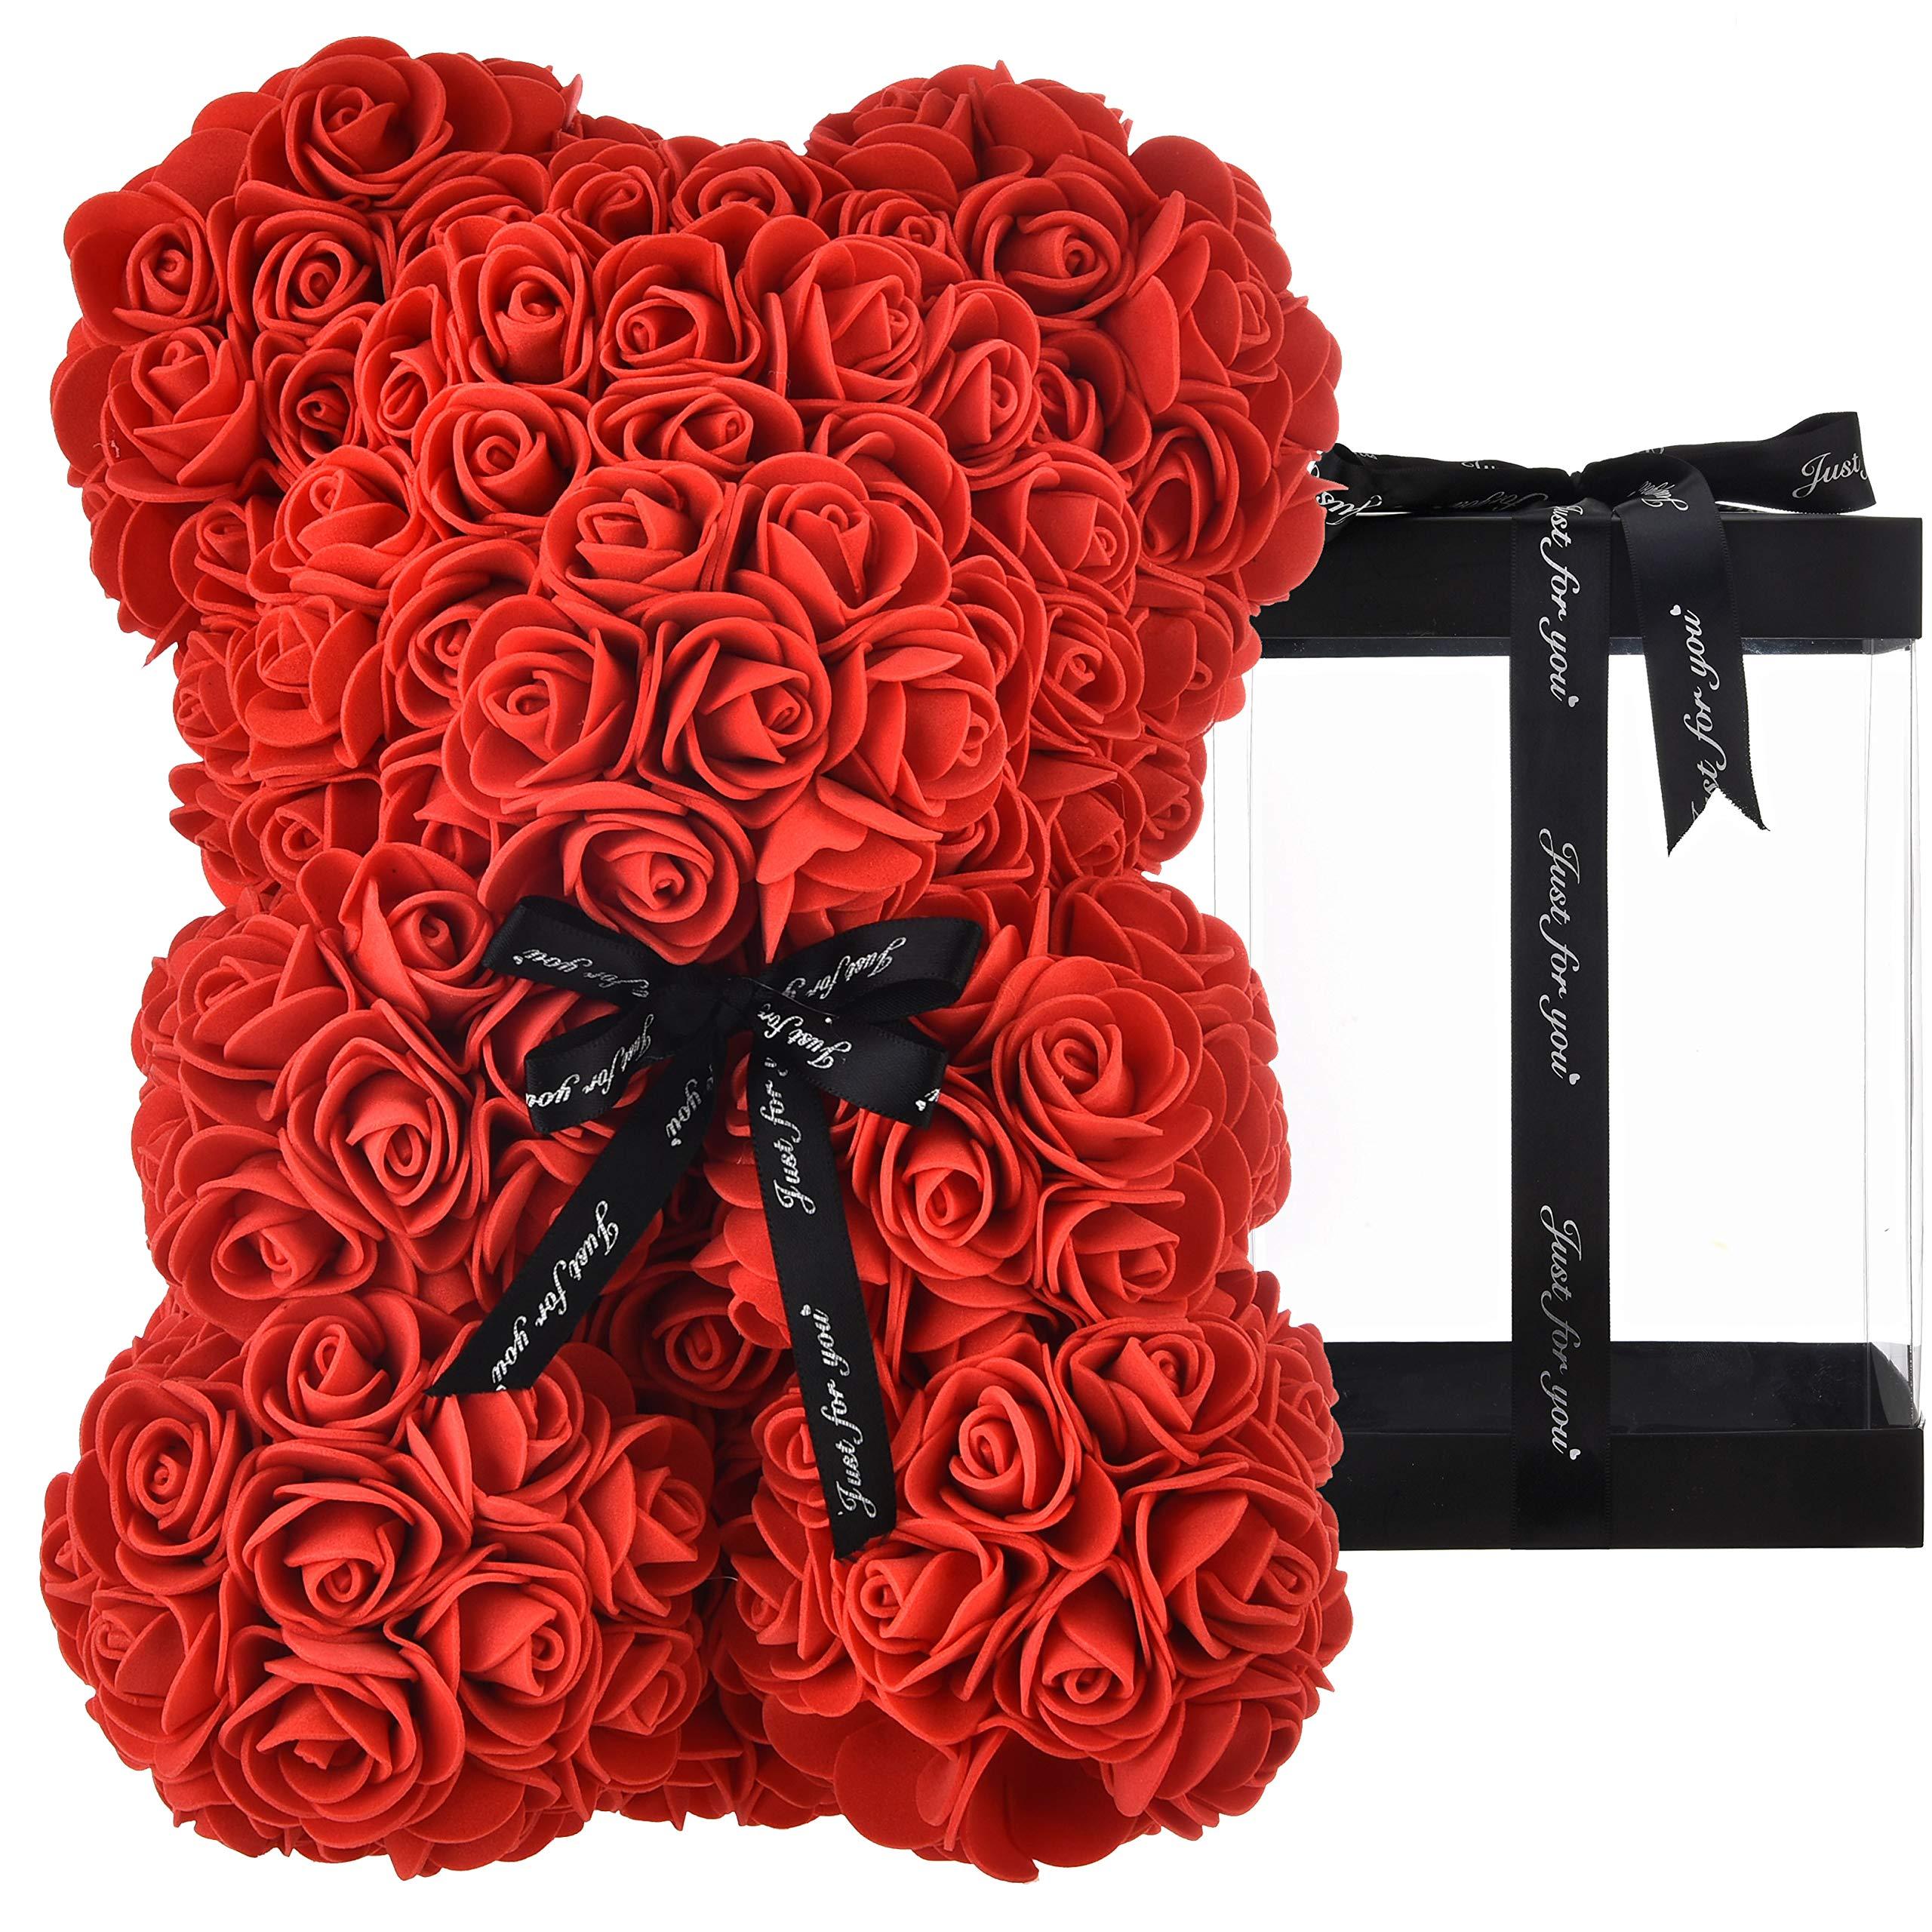 Rosa oso, regalo para mamá, mujer, para adolescentes, regalos para madres,  regalos hechos a mano, osito